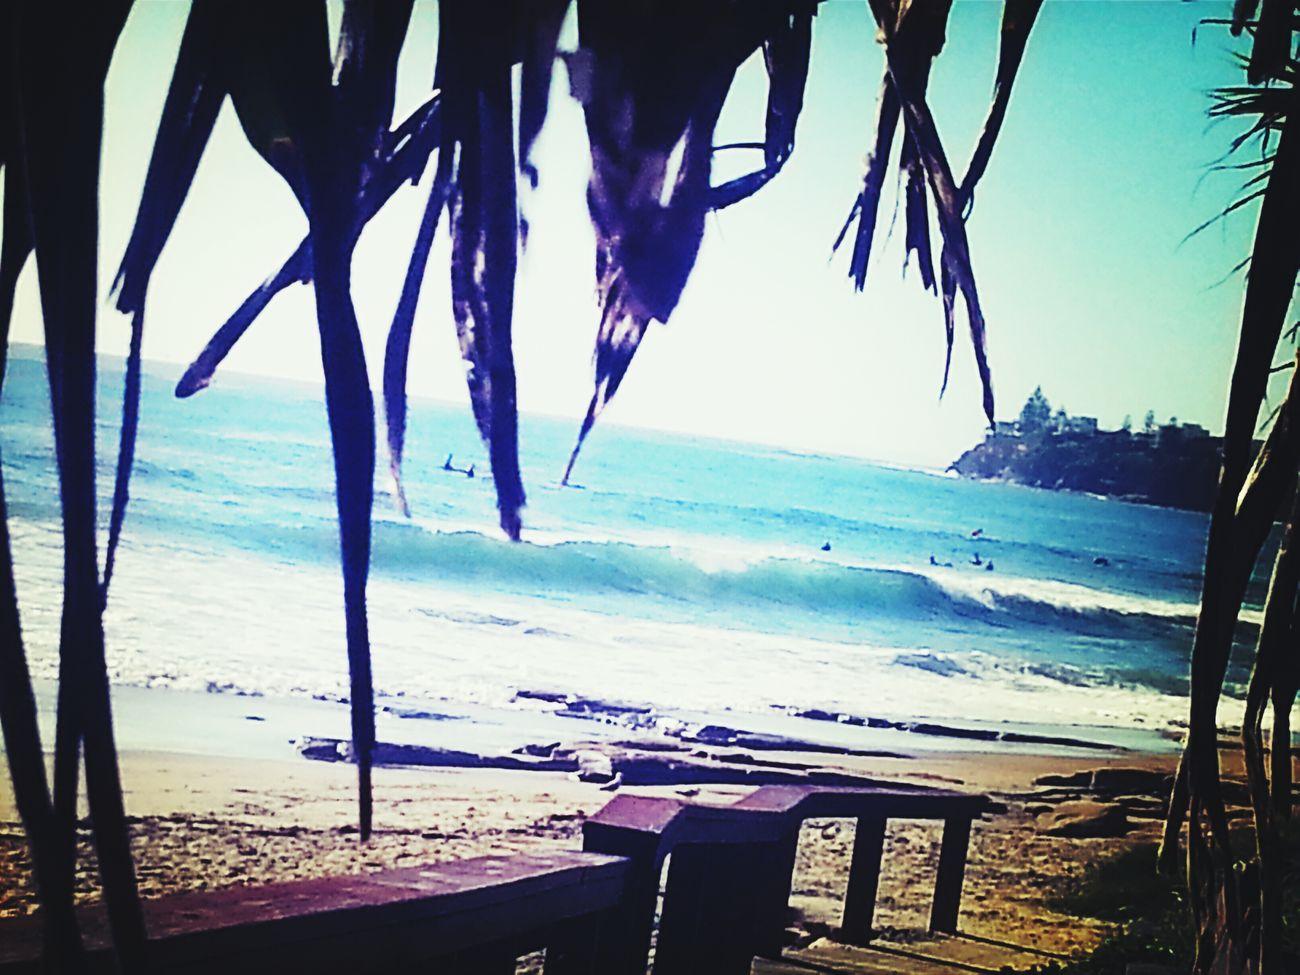 Life Is A Beach Queenslandsbeauty Surfingwithyourkids Dickysbeach